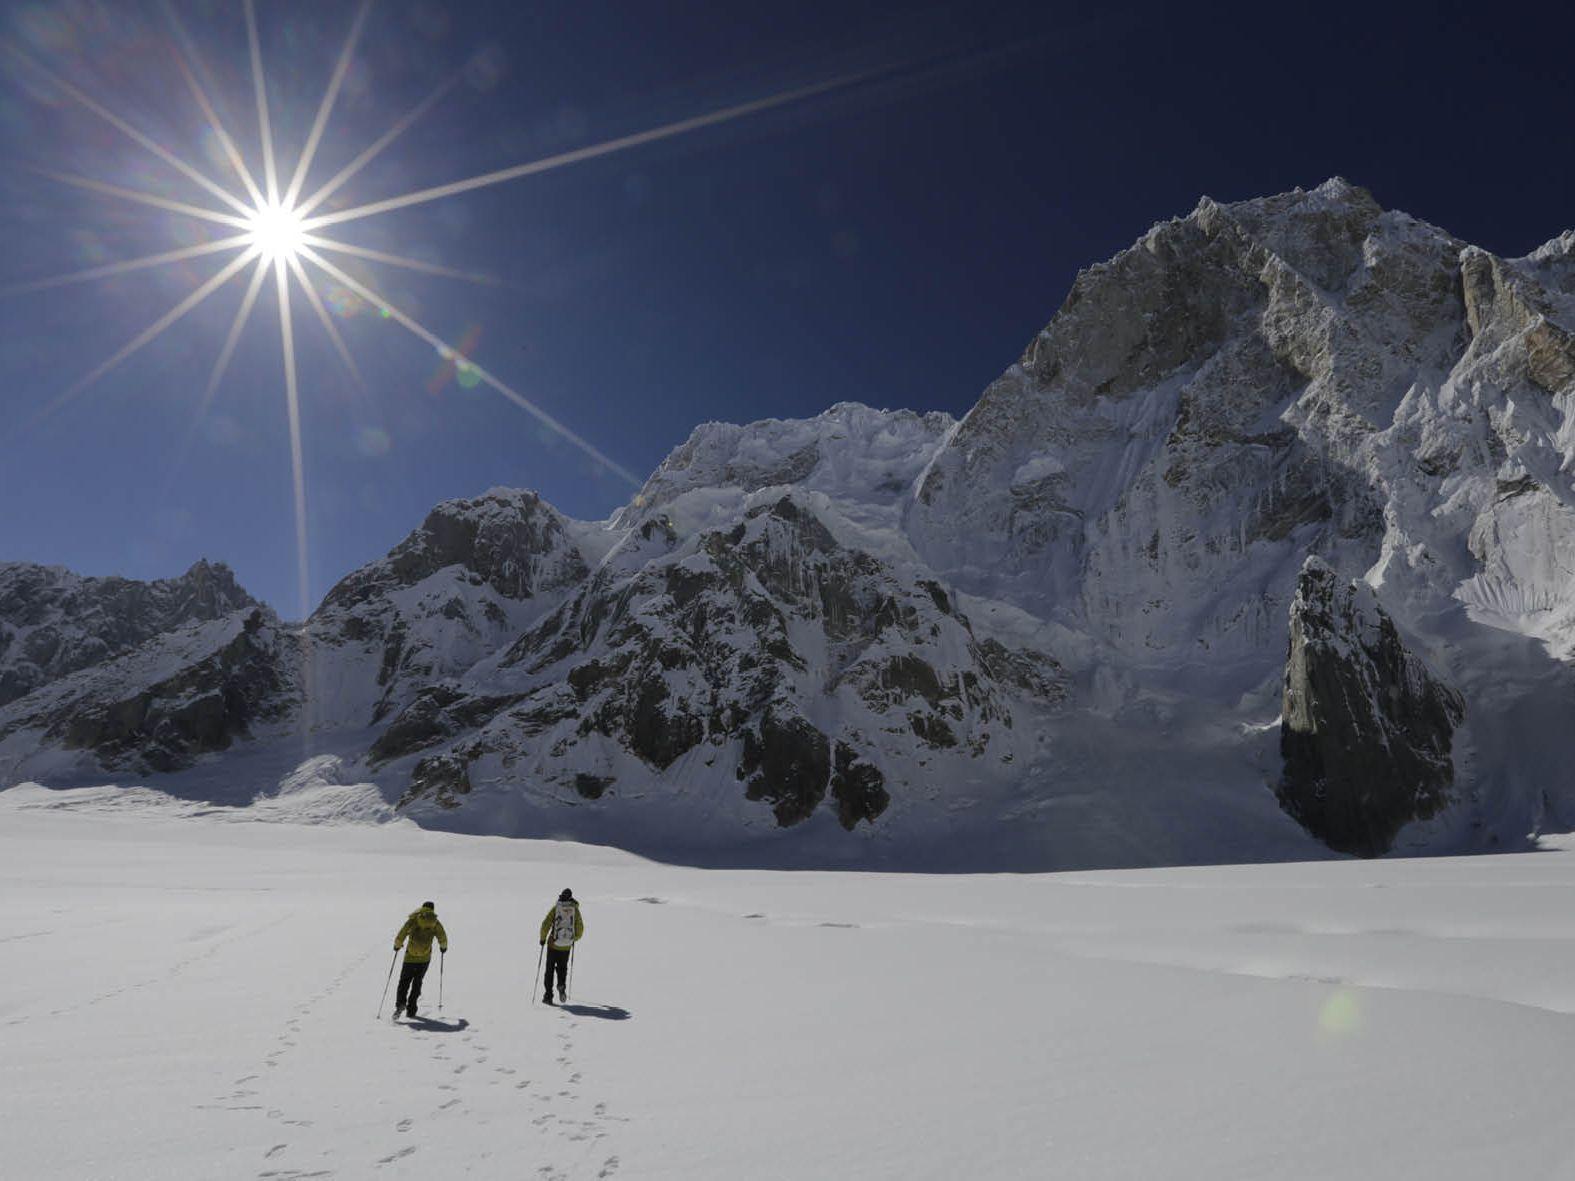 Steiles Leben Thomas Huber Fernweh Winter Live Abenteuer Hautnah Erleben